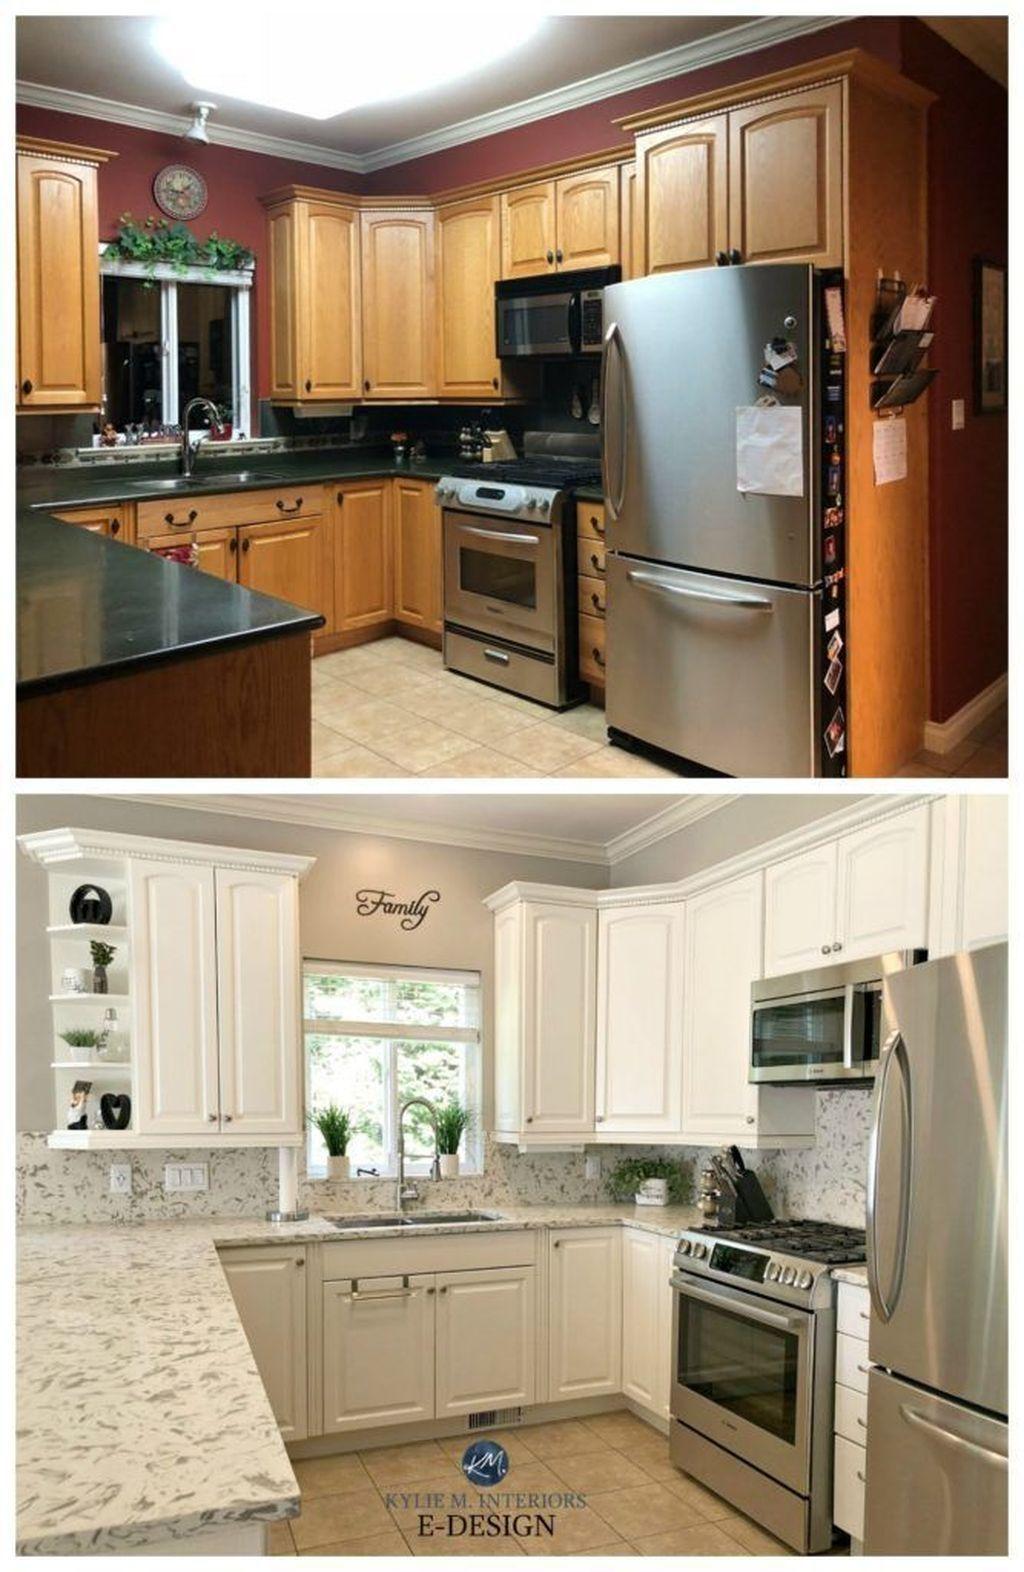 37 Marvelous Farmhouse Kitchen Cabinet Makeover Design Ideas To Try Kitchen Diy Makeover Kitchen Makeover Kitchen Design